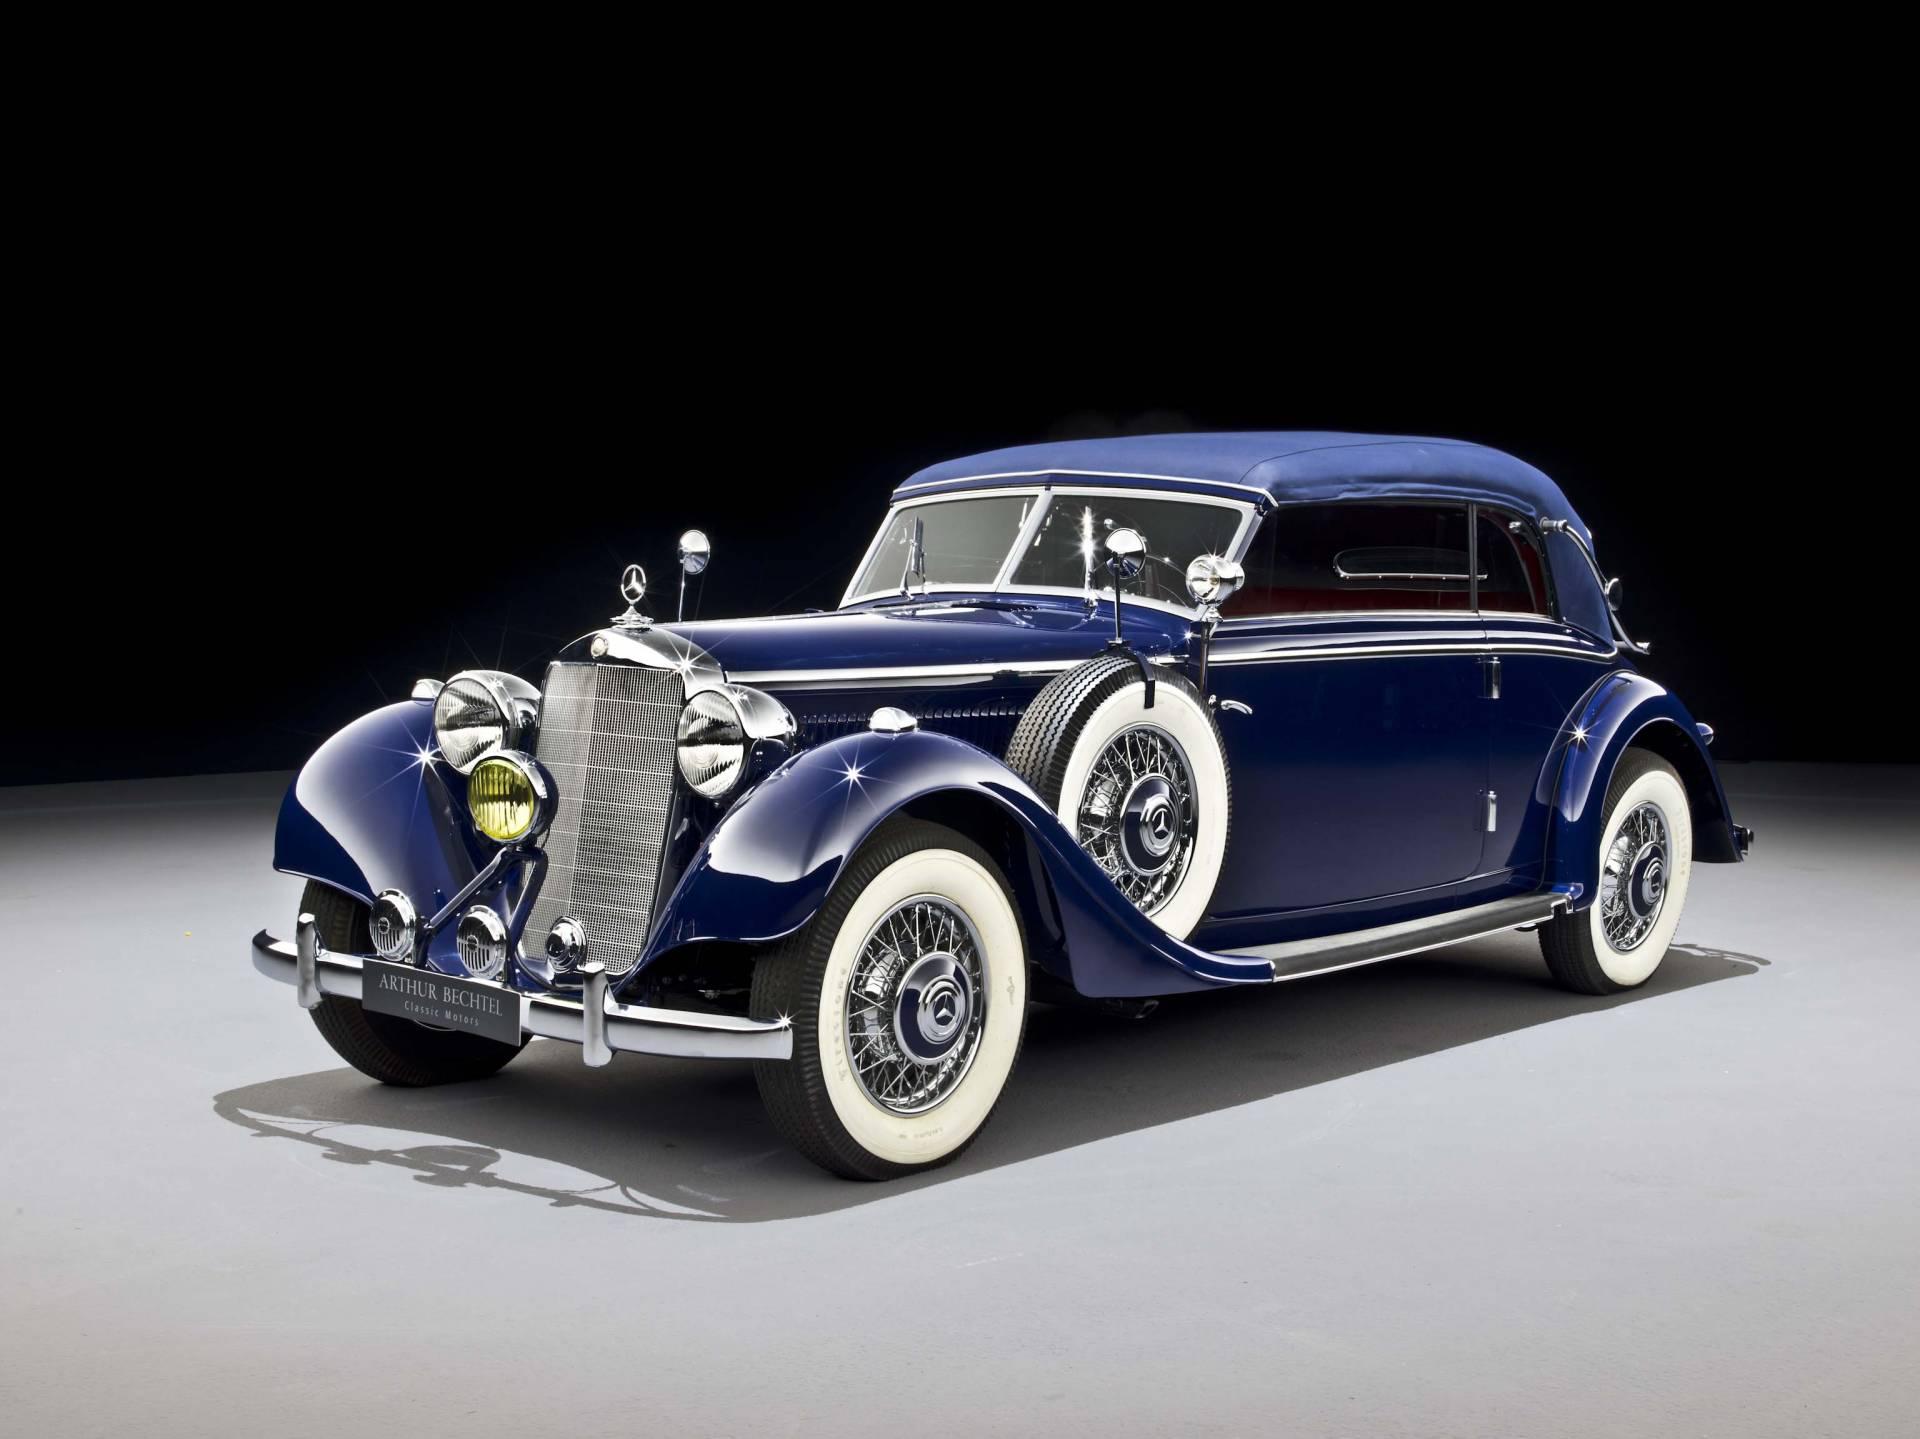 mercedes benz 320 cabriolet b 1938 kaufen classic trader. Black Bedroom Furniture Sets. Home Design Ideas